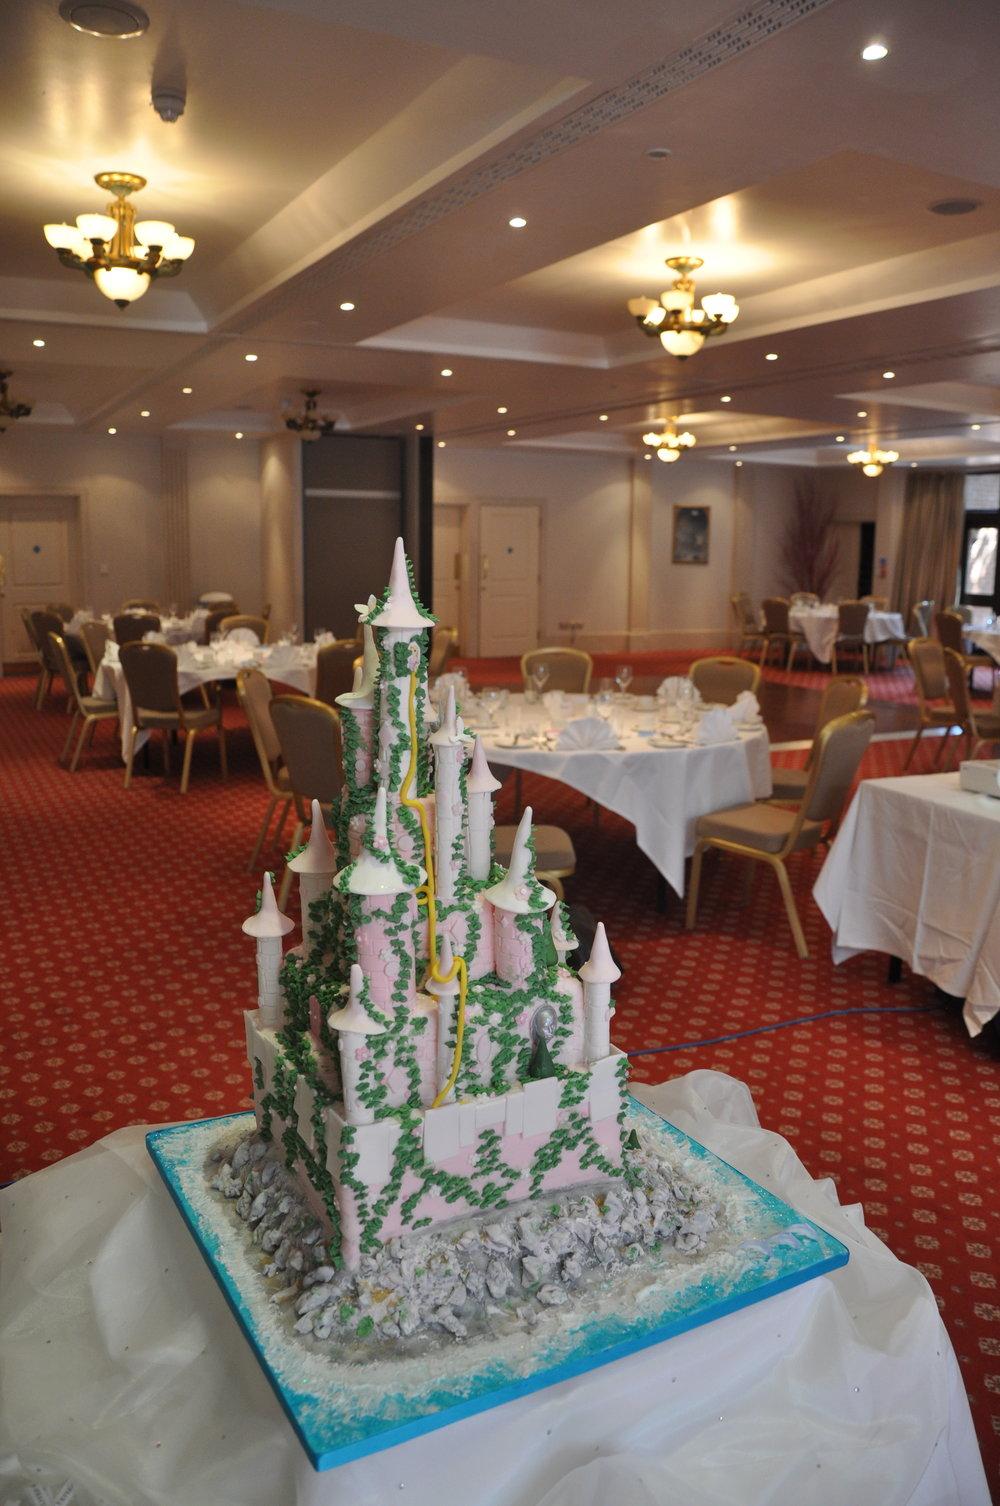 2012-06-30 Disney Princess Castle Cake 03.JPG